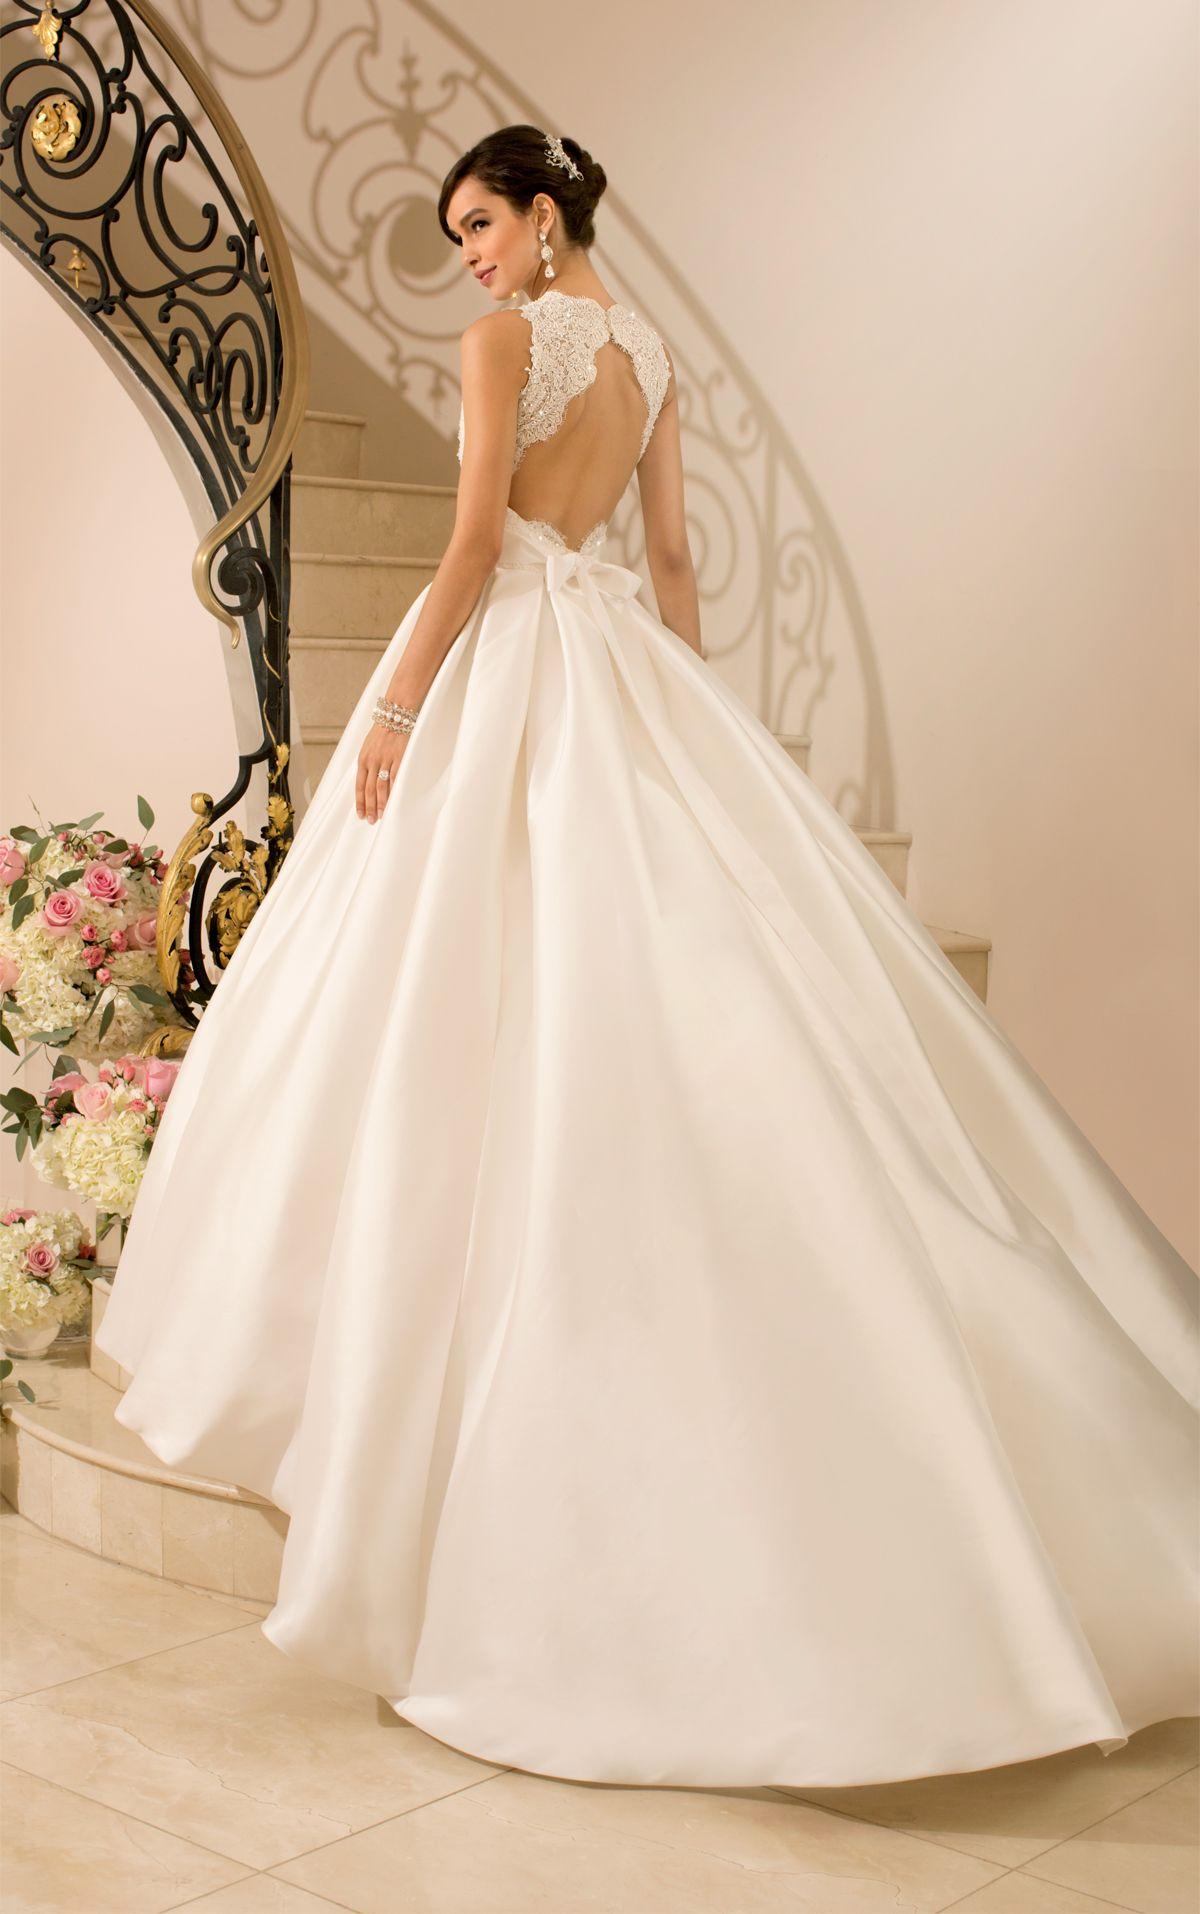 Stella york wedding dresses 2014 1 01162014g 12001914 stella york wedding dresses 2014 1 01162014g junglespirit Images